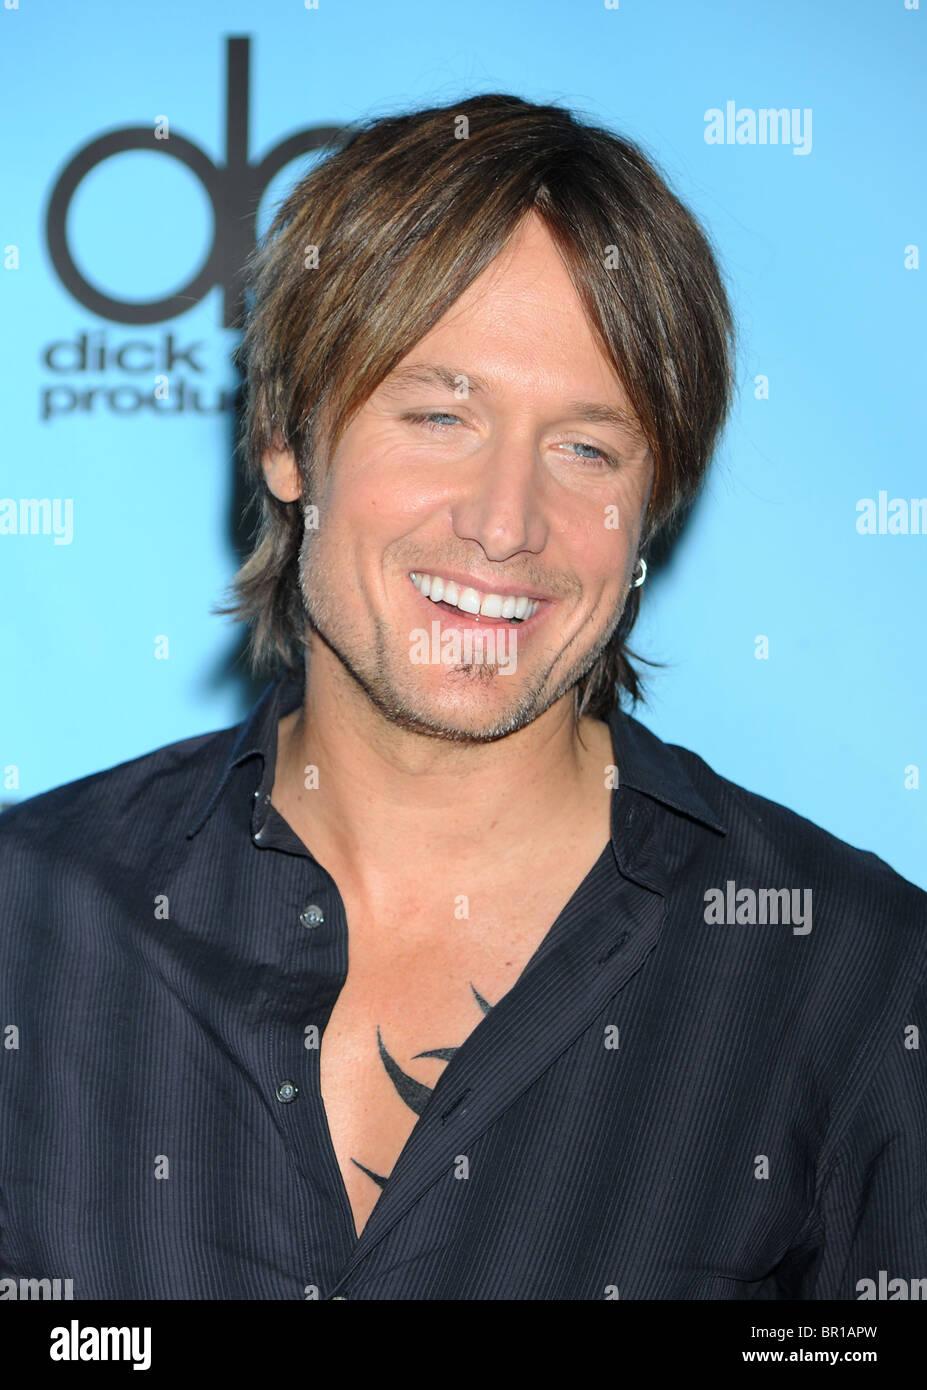 KEITH URBAN - US singer in November 2009. Photo Jeffrey Mayer - Stock Image